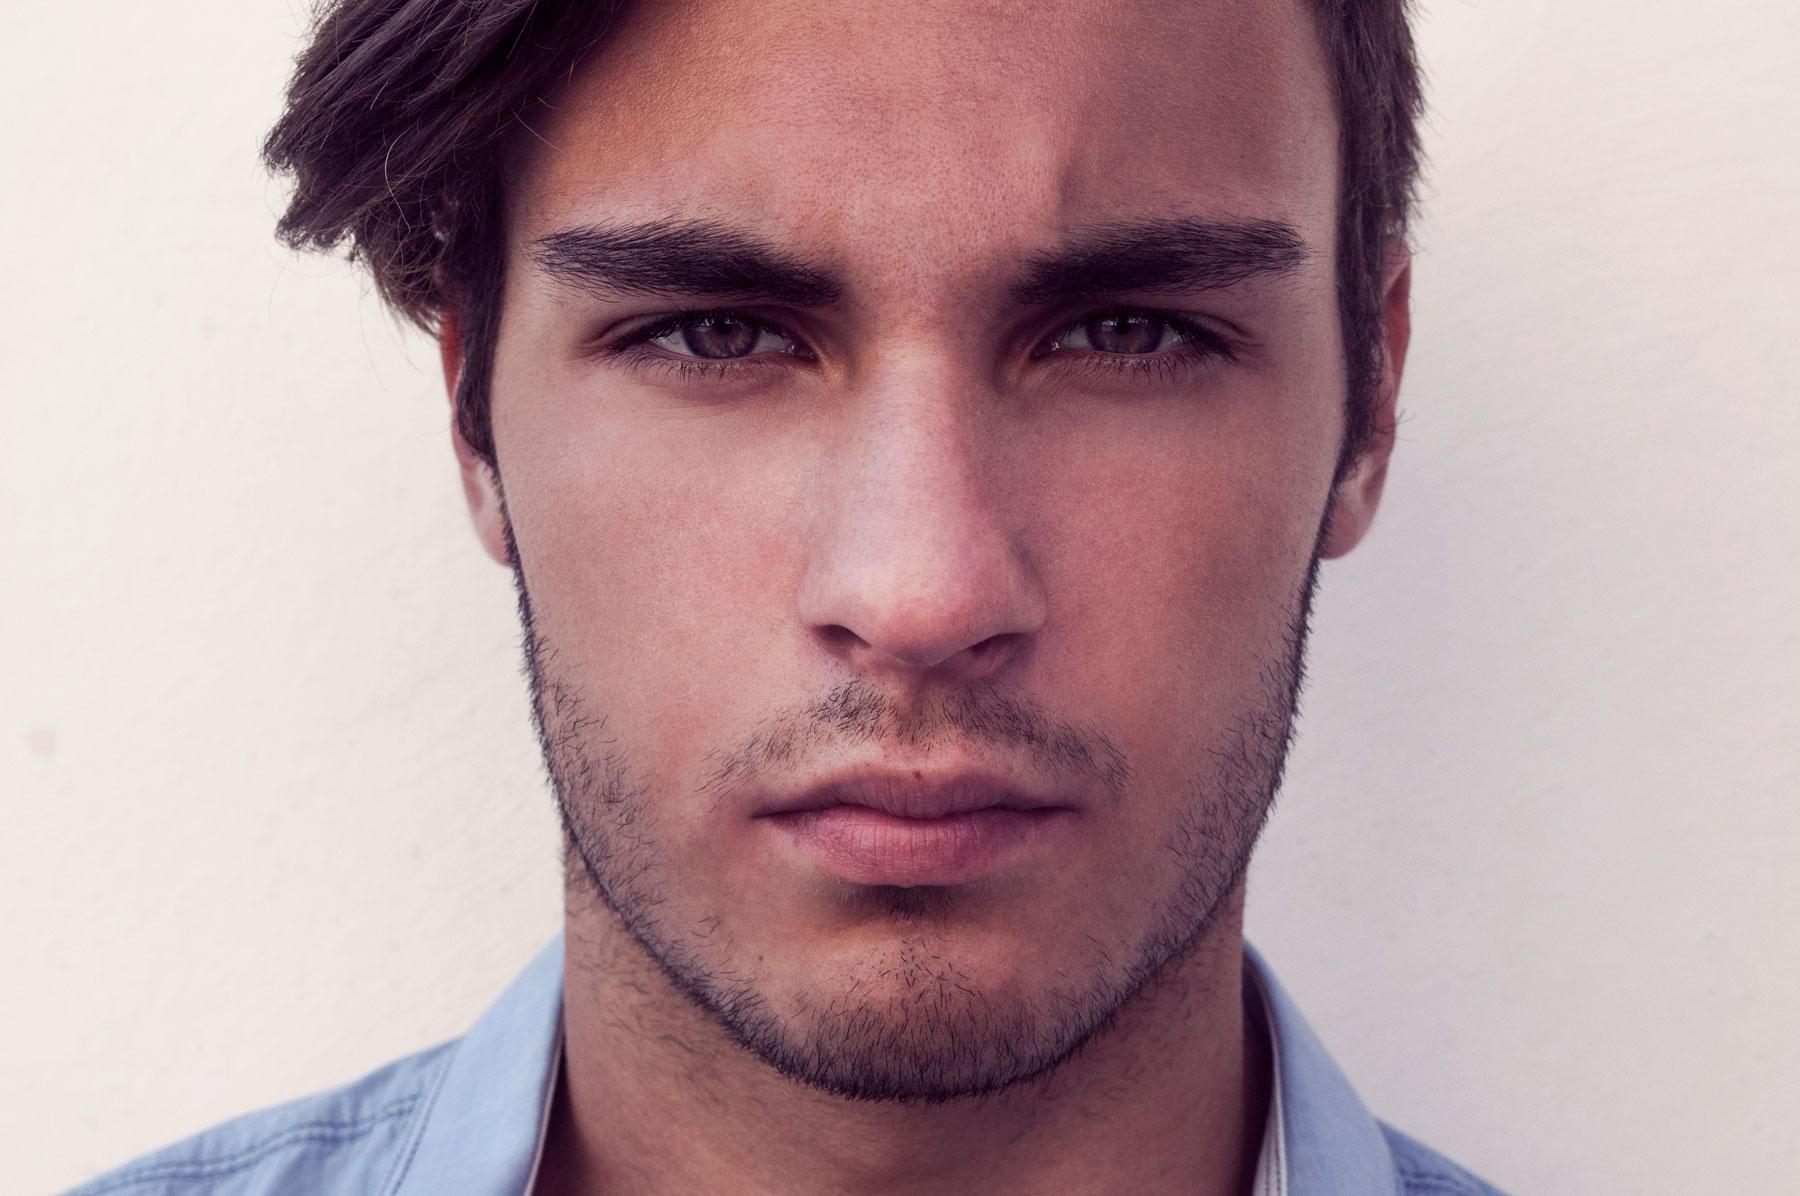 max-makela-male-model-finland-face.jpg